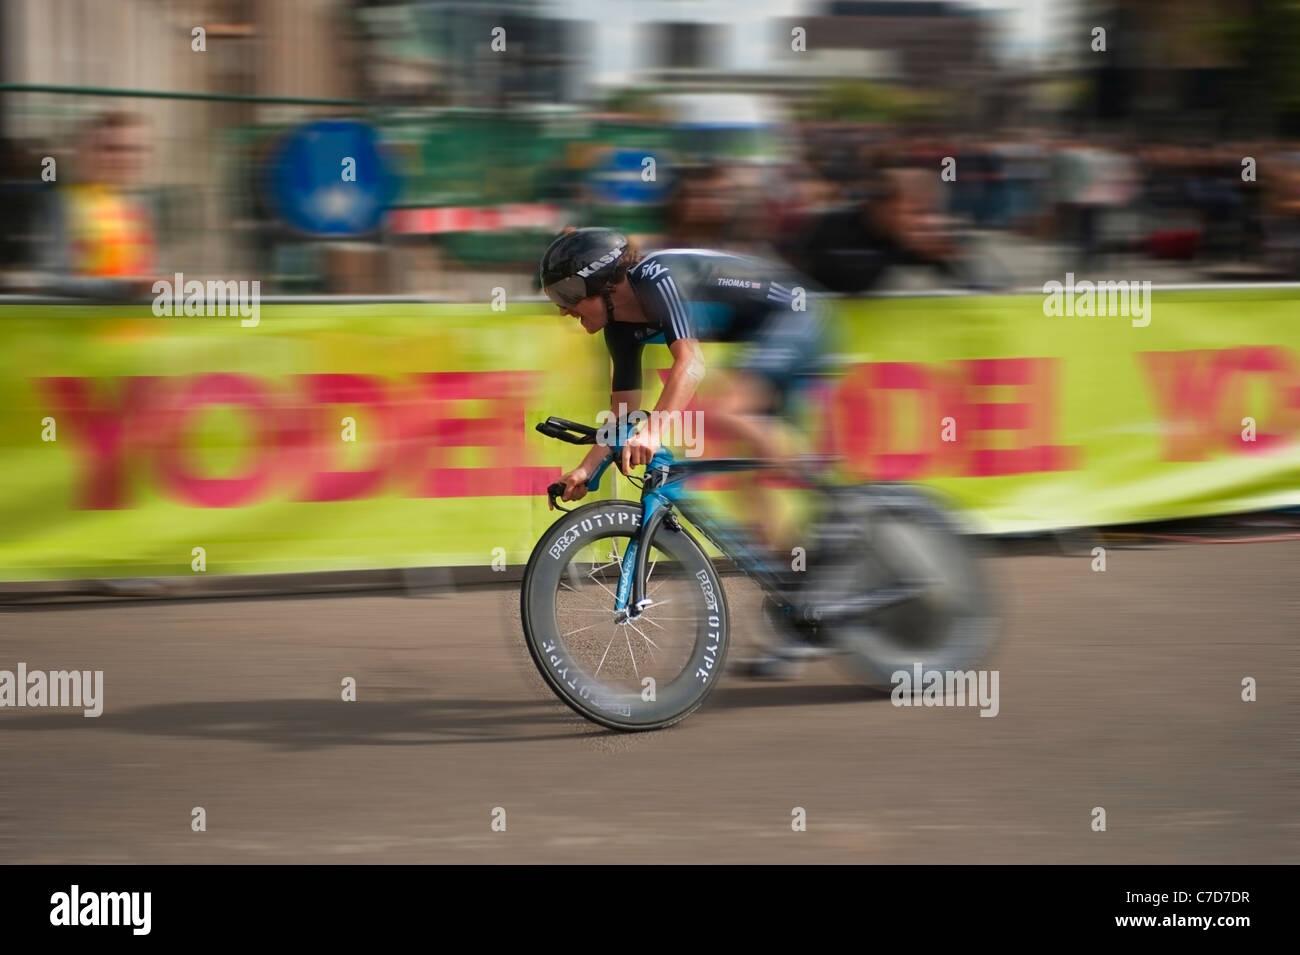 geraint-thomas-of-sky-professional-cycli